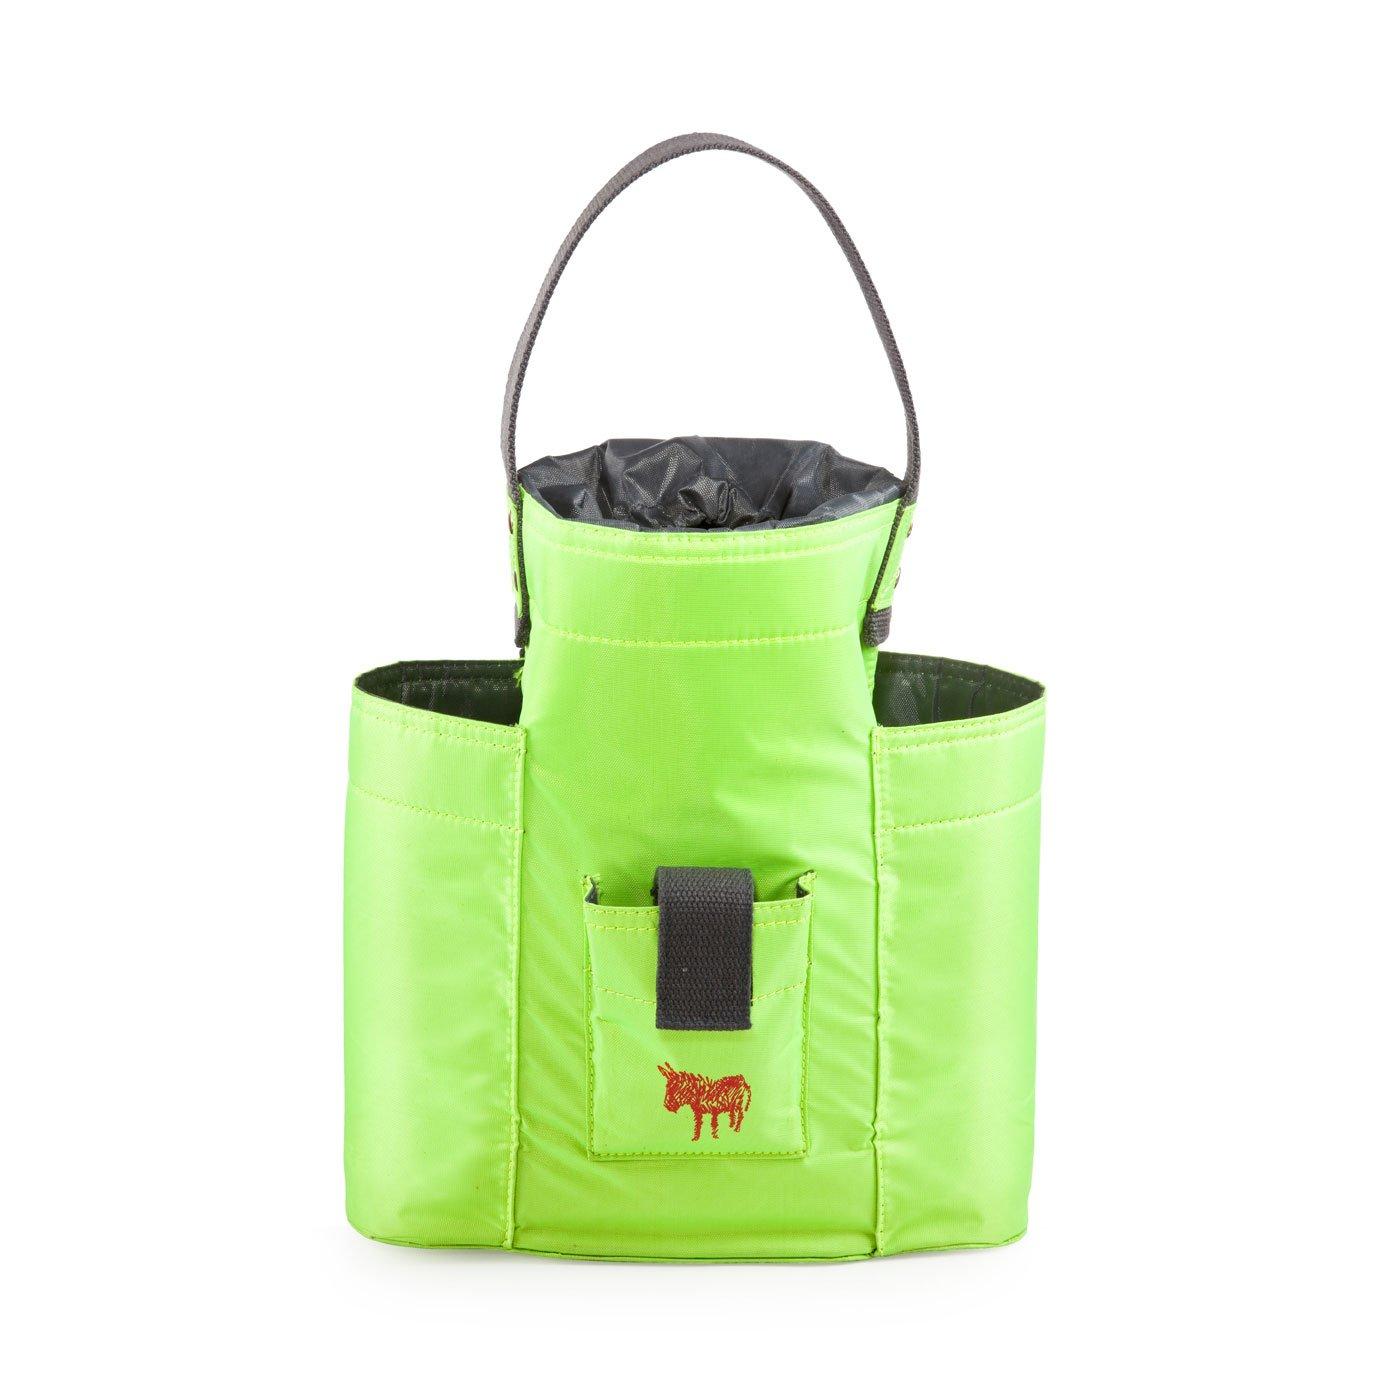 Bike Bag Lady Green Cool & Convenient Wine Bottle Carrier Bags